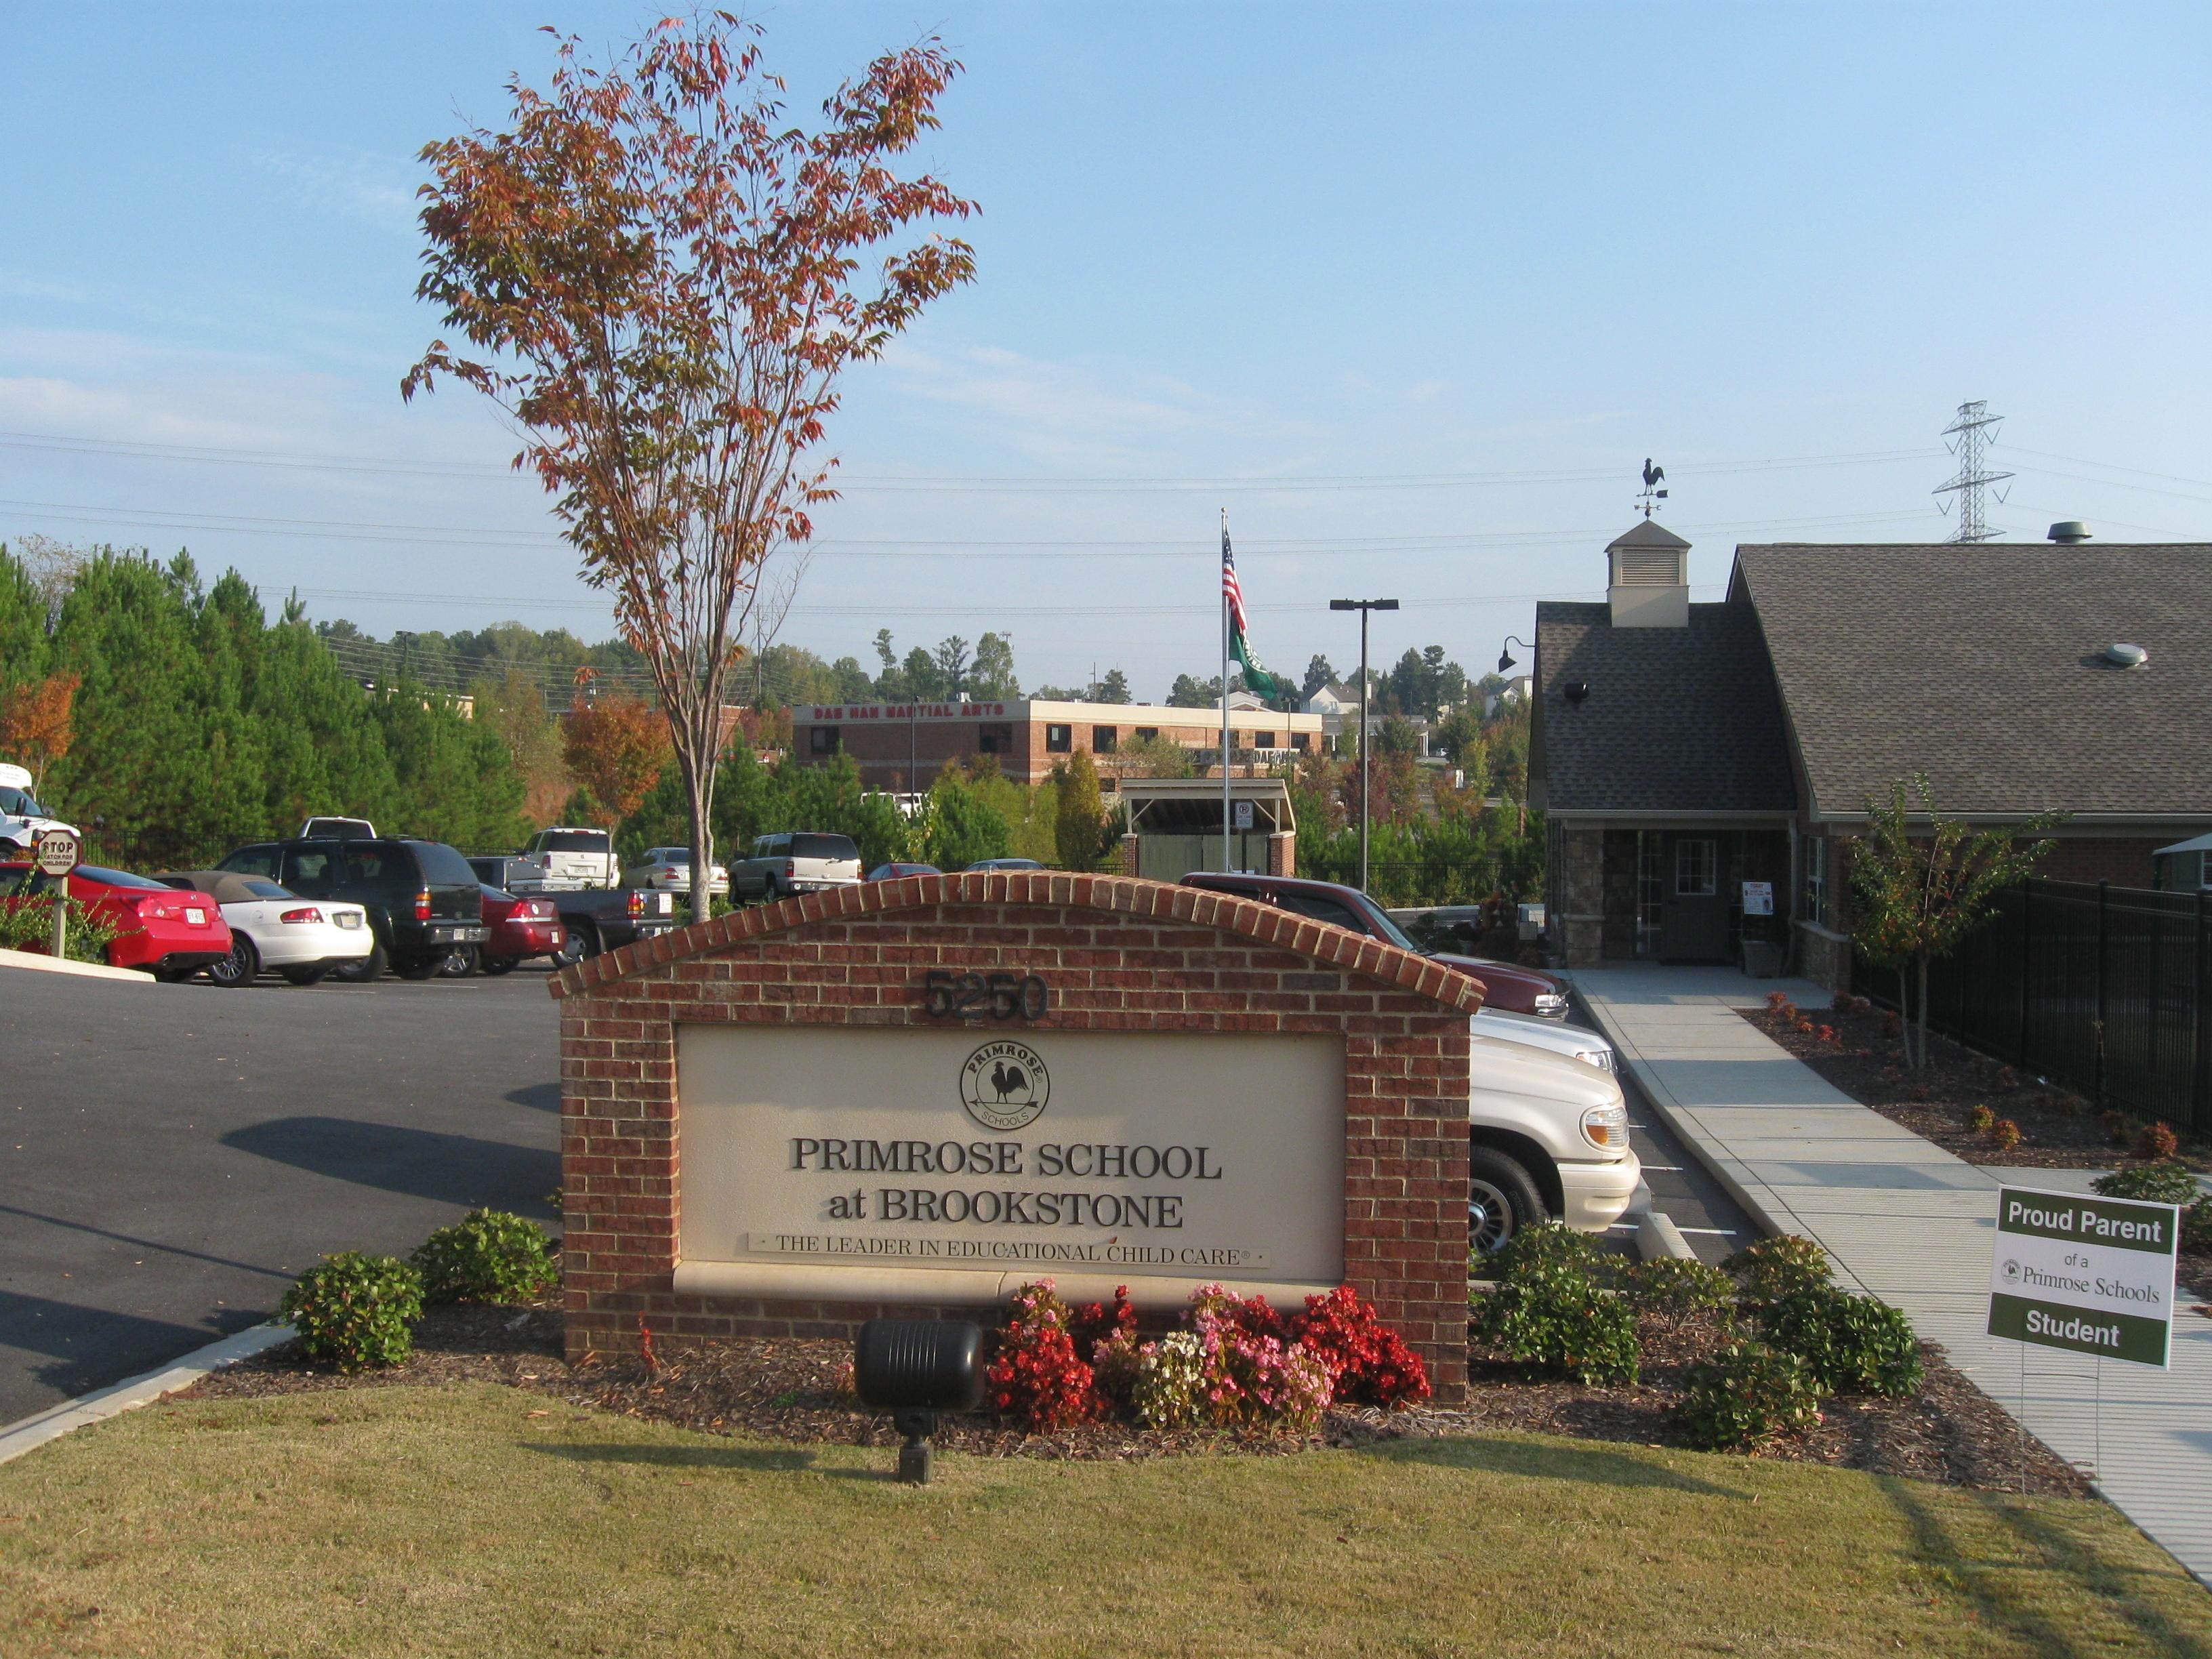 Primrose School at Brookstone